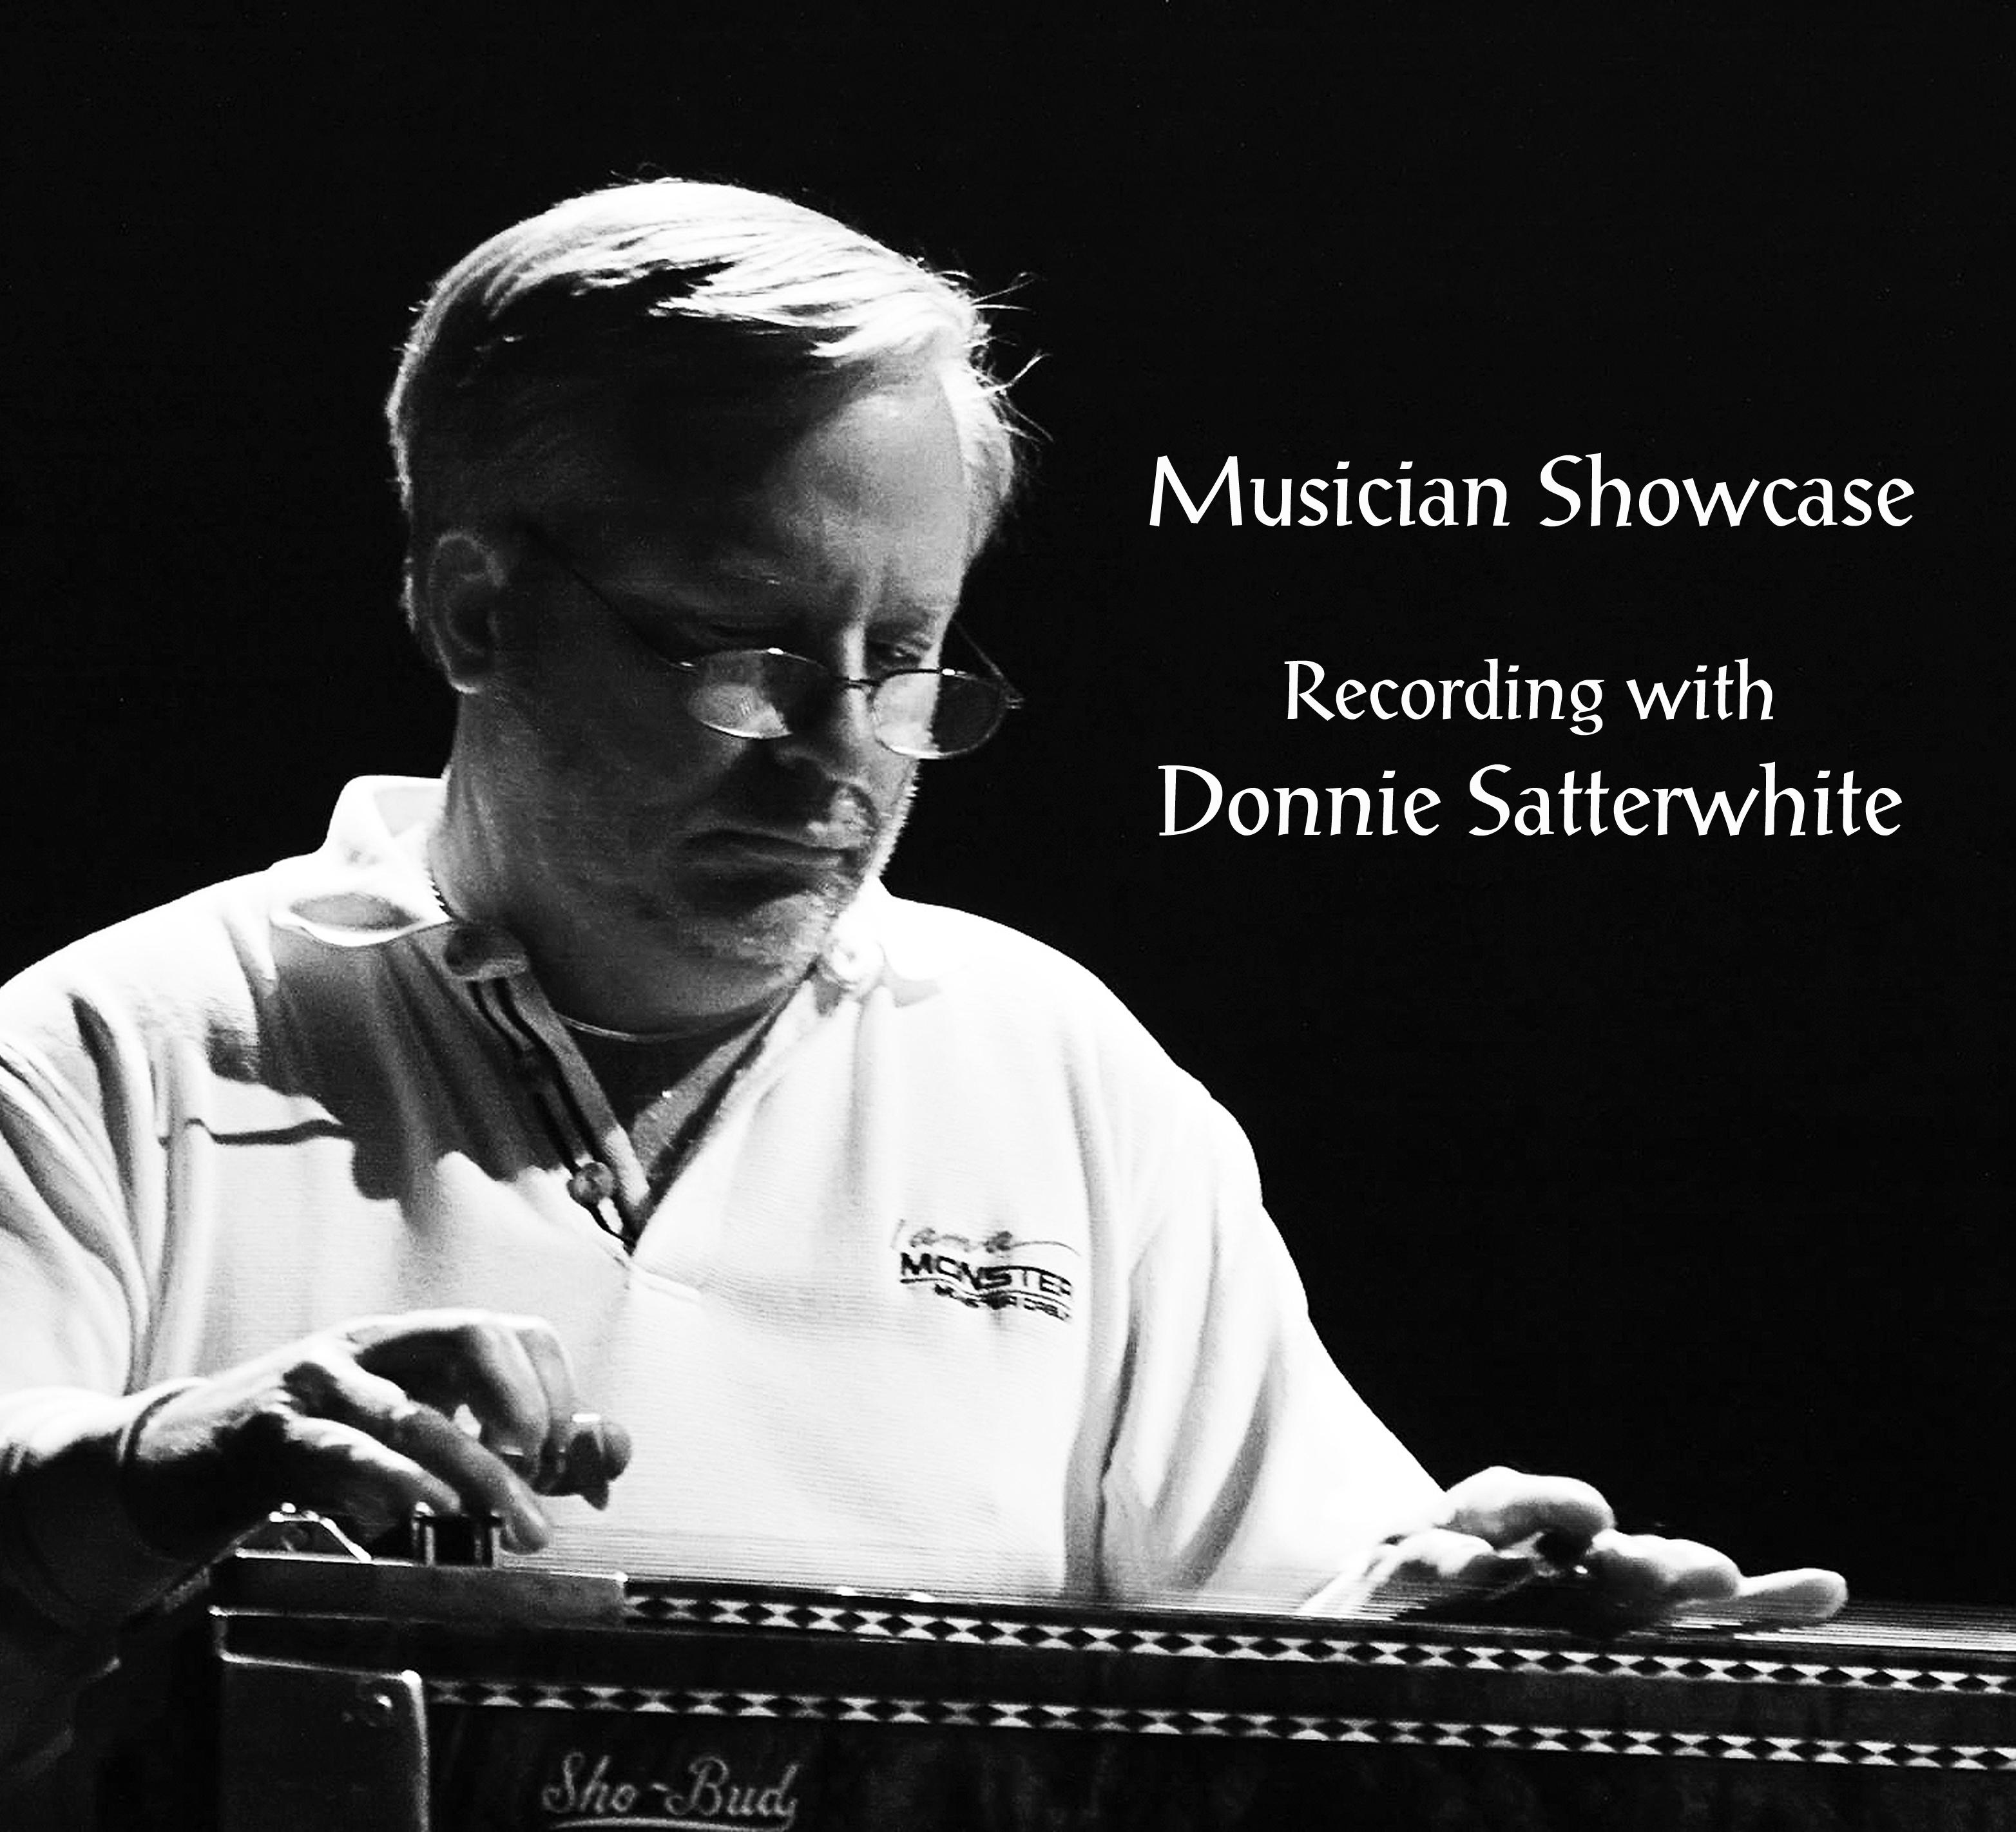 Musician Showcase